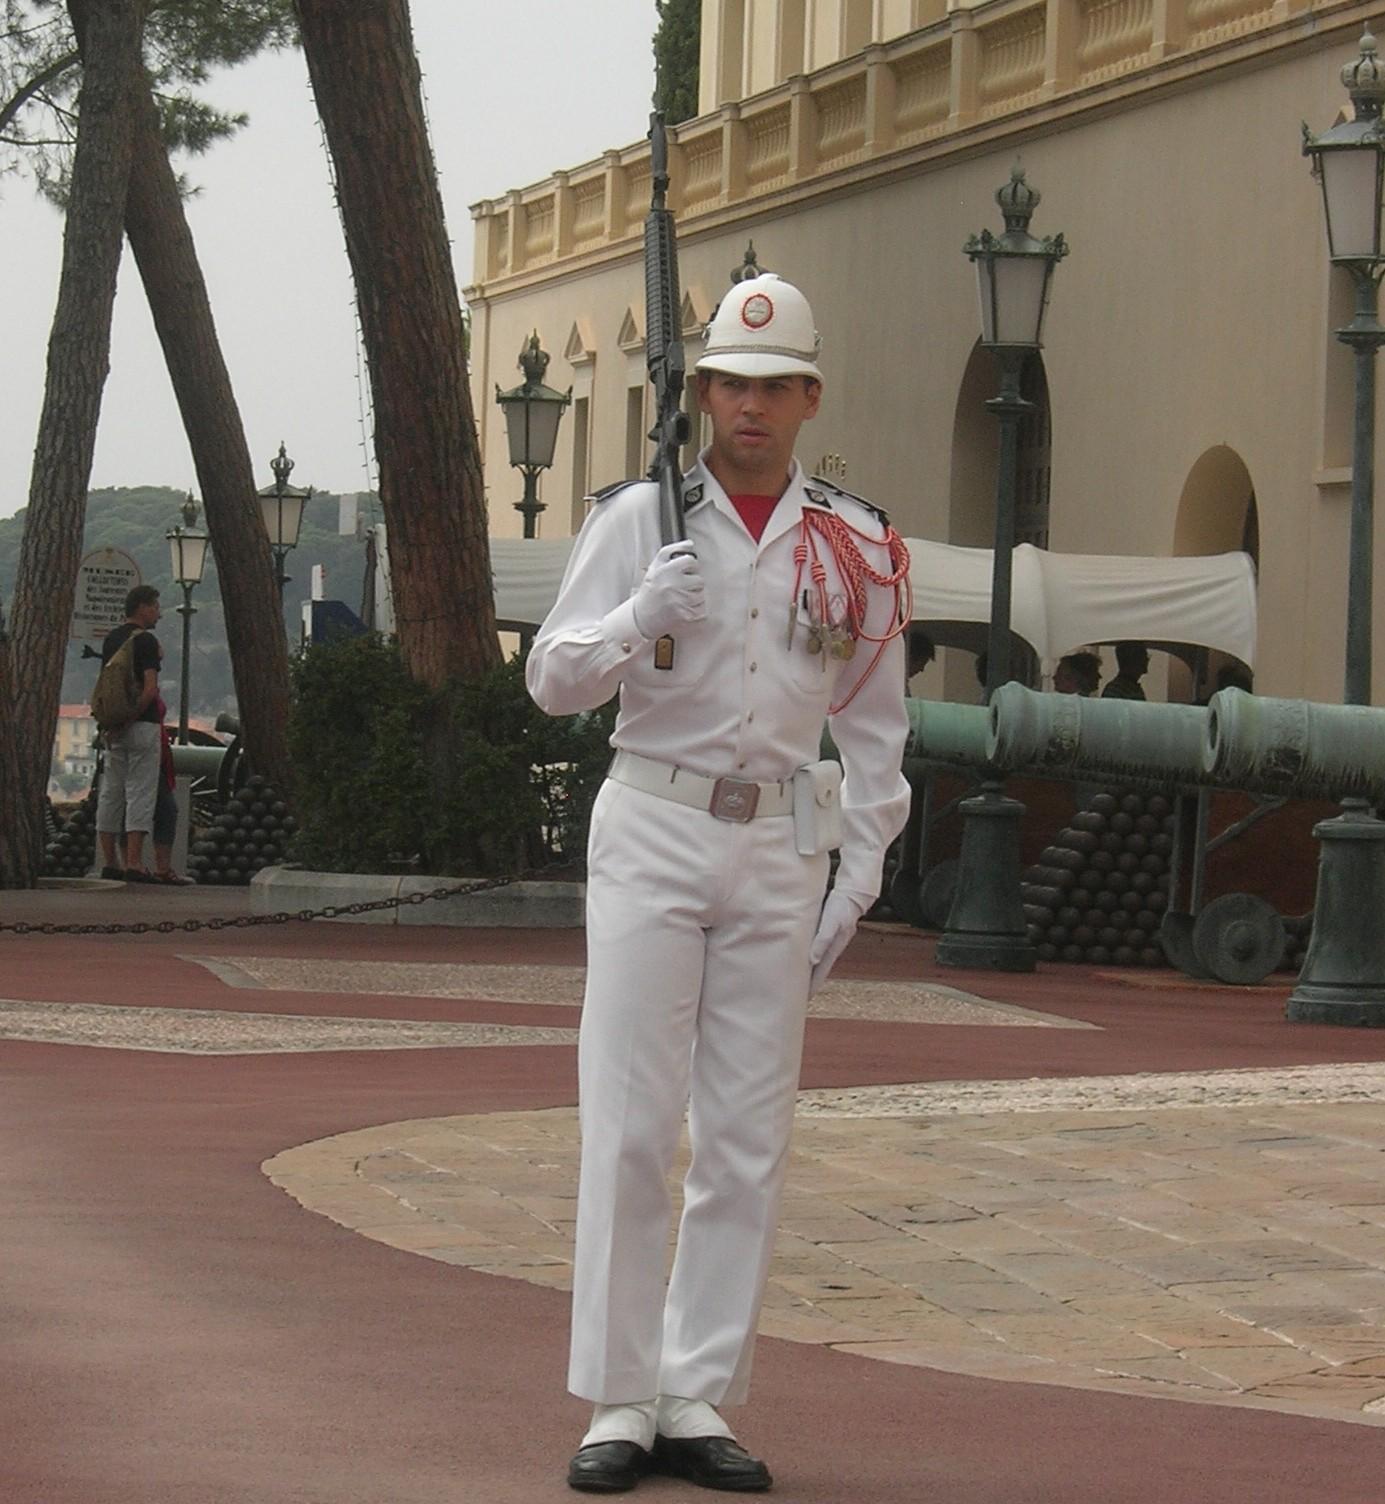 File:Monaco-military-02.JPG - Wikipedia